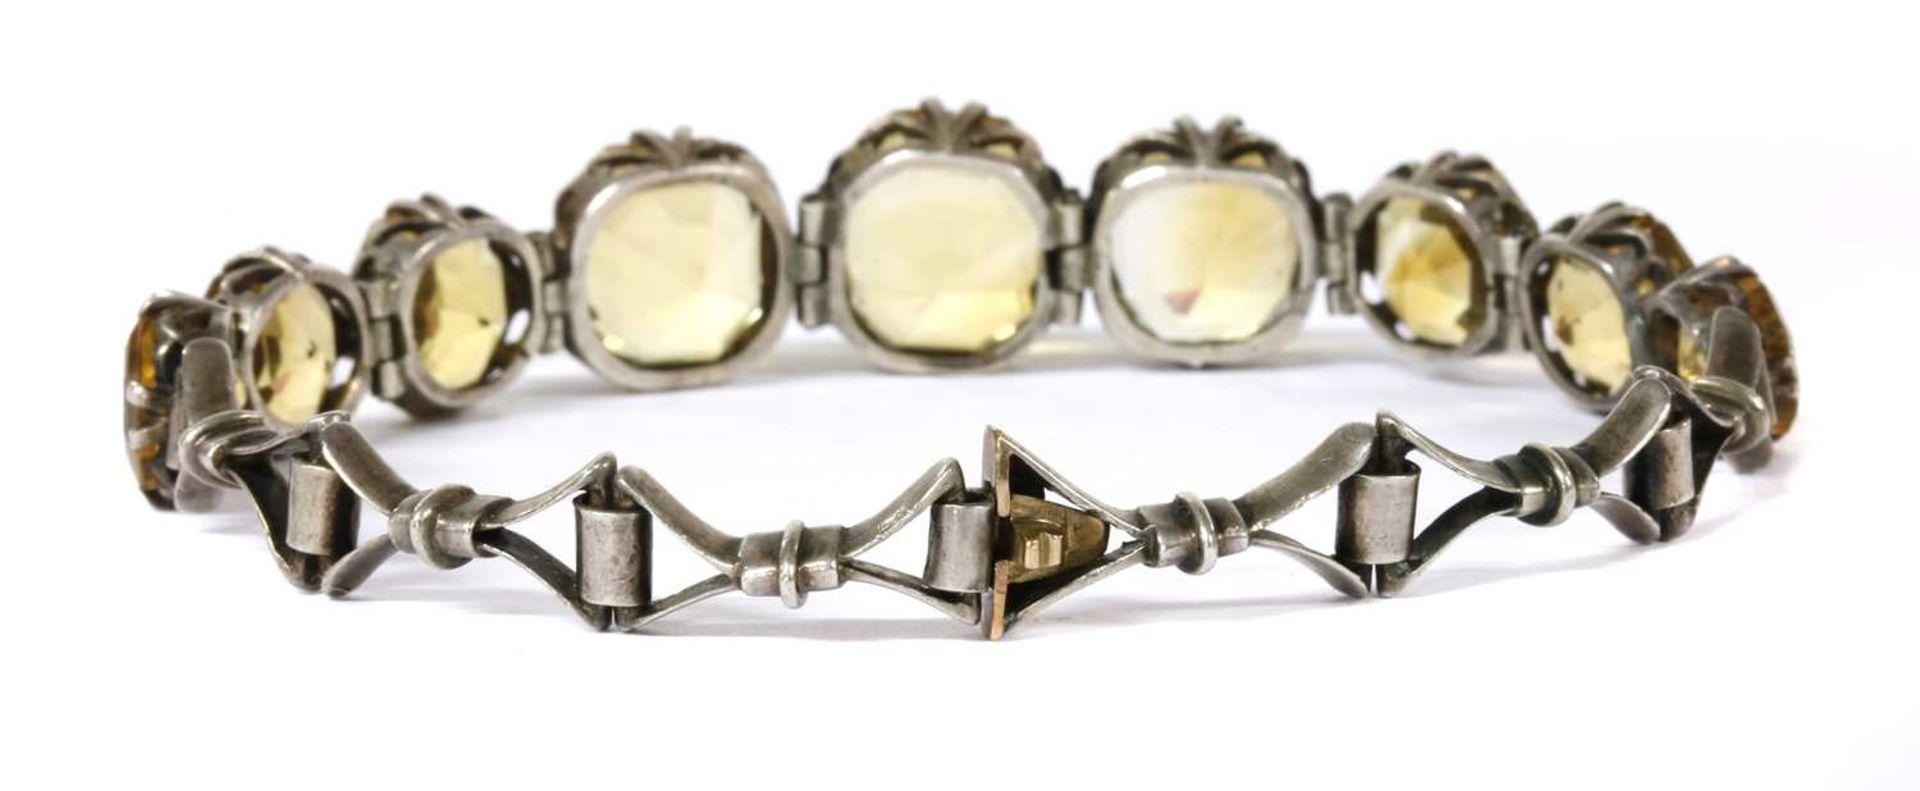 A silver citrine bracelet, - Image 2 of 8